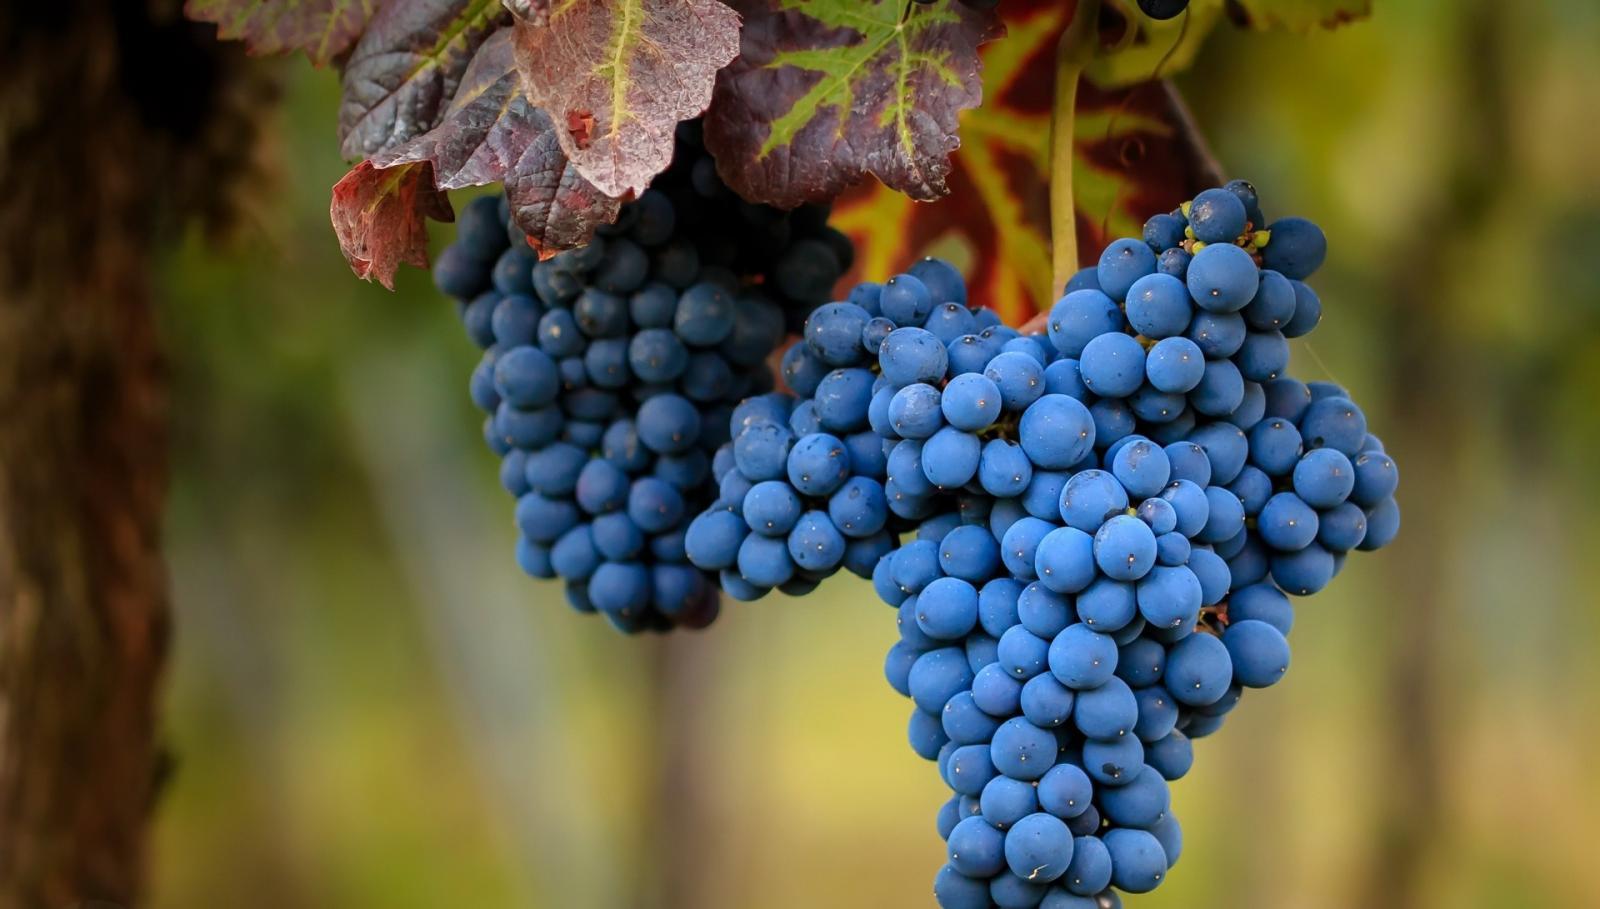 В Брянскую область не пустили почти 20 тонн турецкого винограда